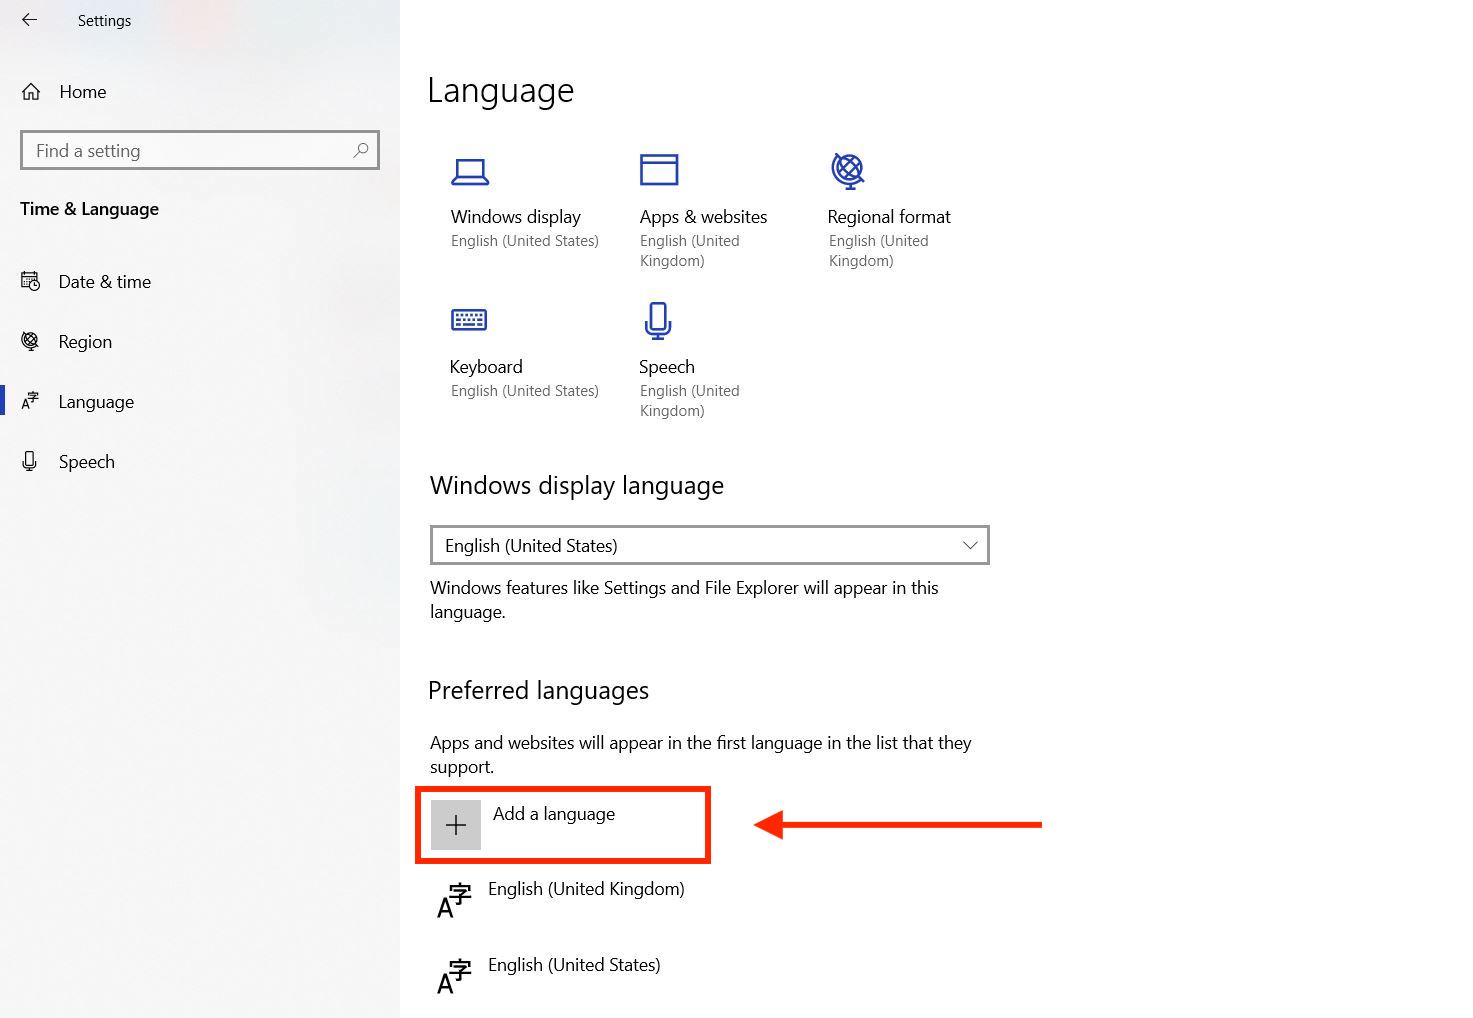 How to change keyboard language in Windows - add language